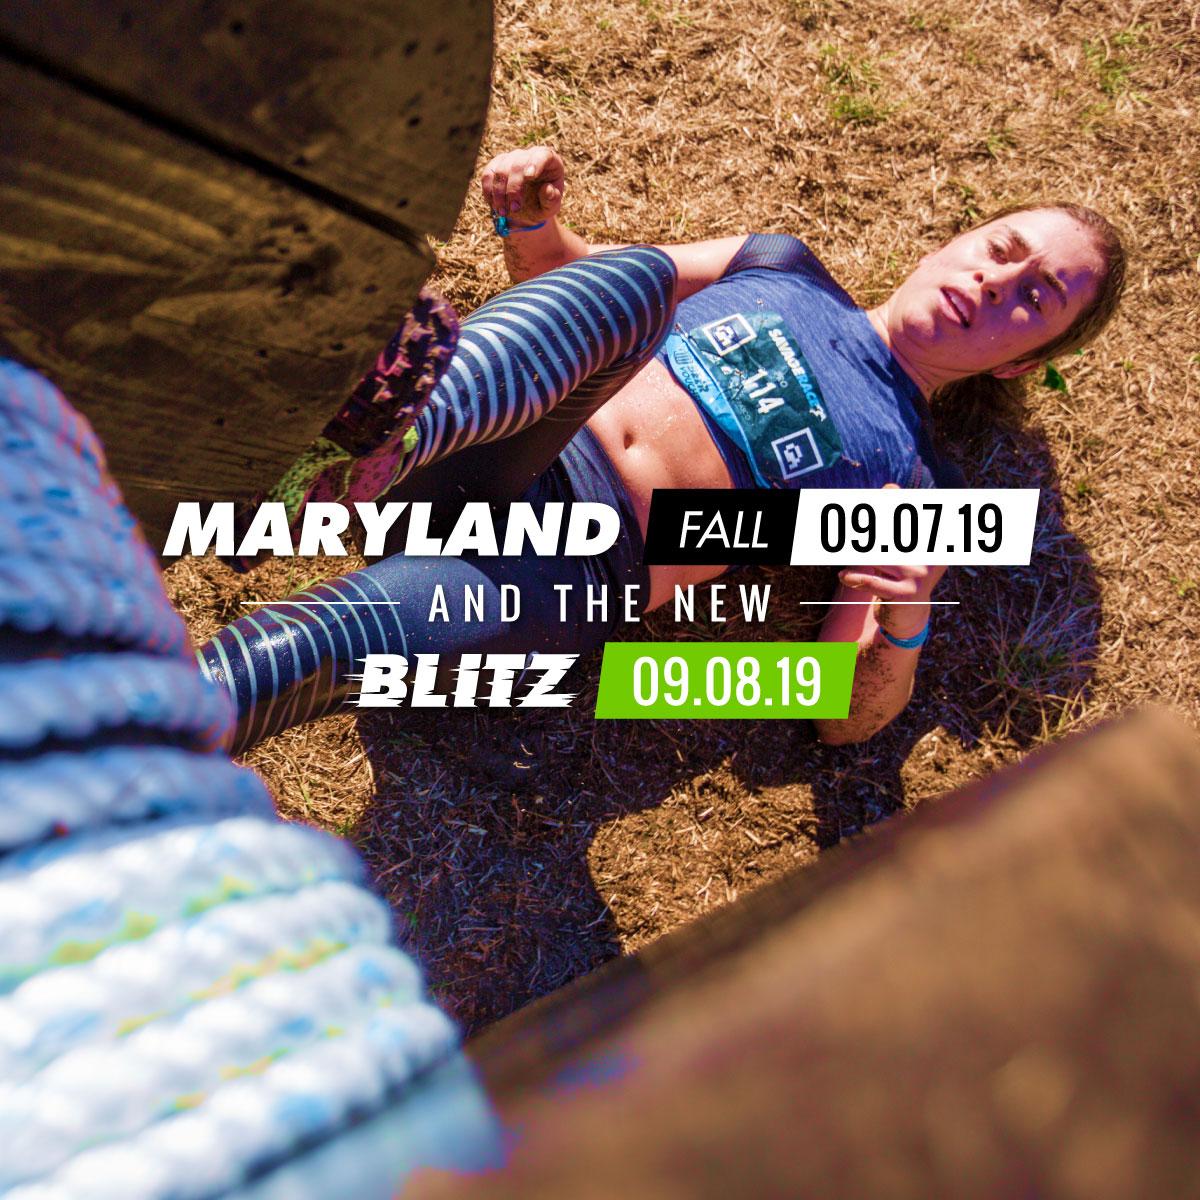 Savage Race Maryland Fall 2019